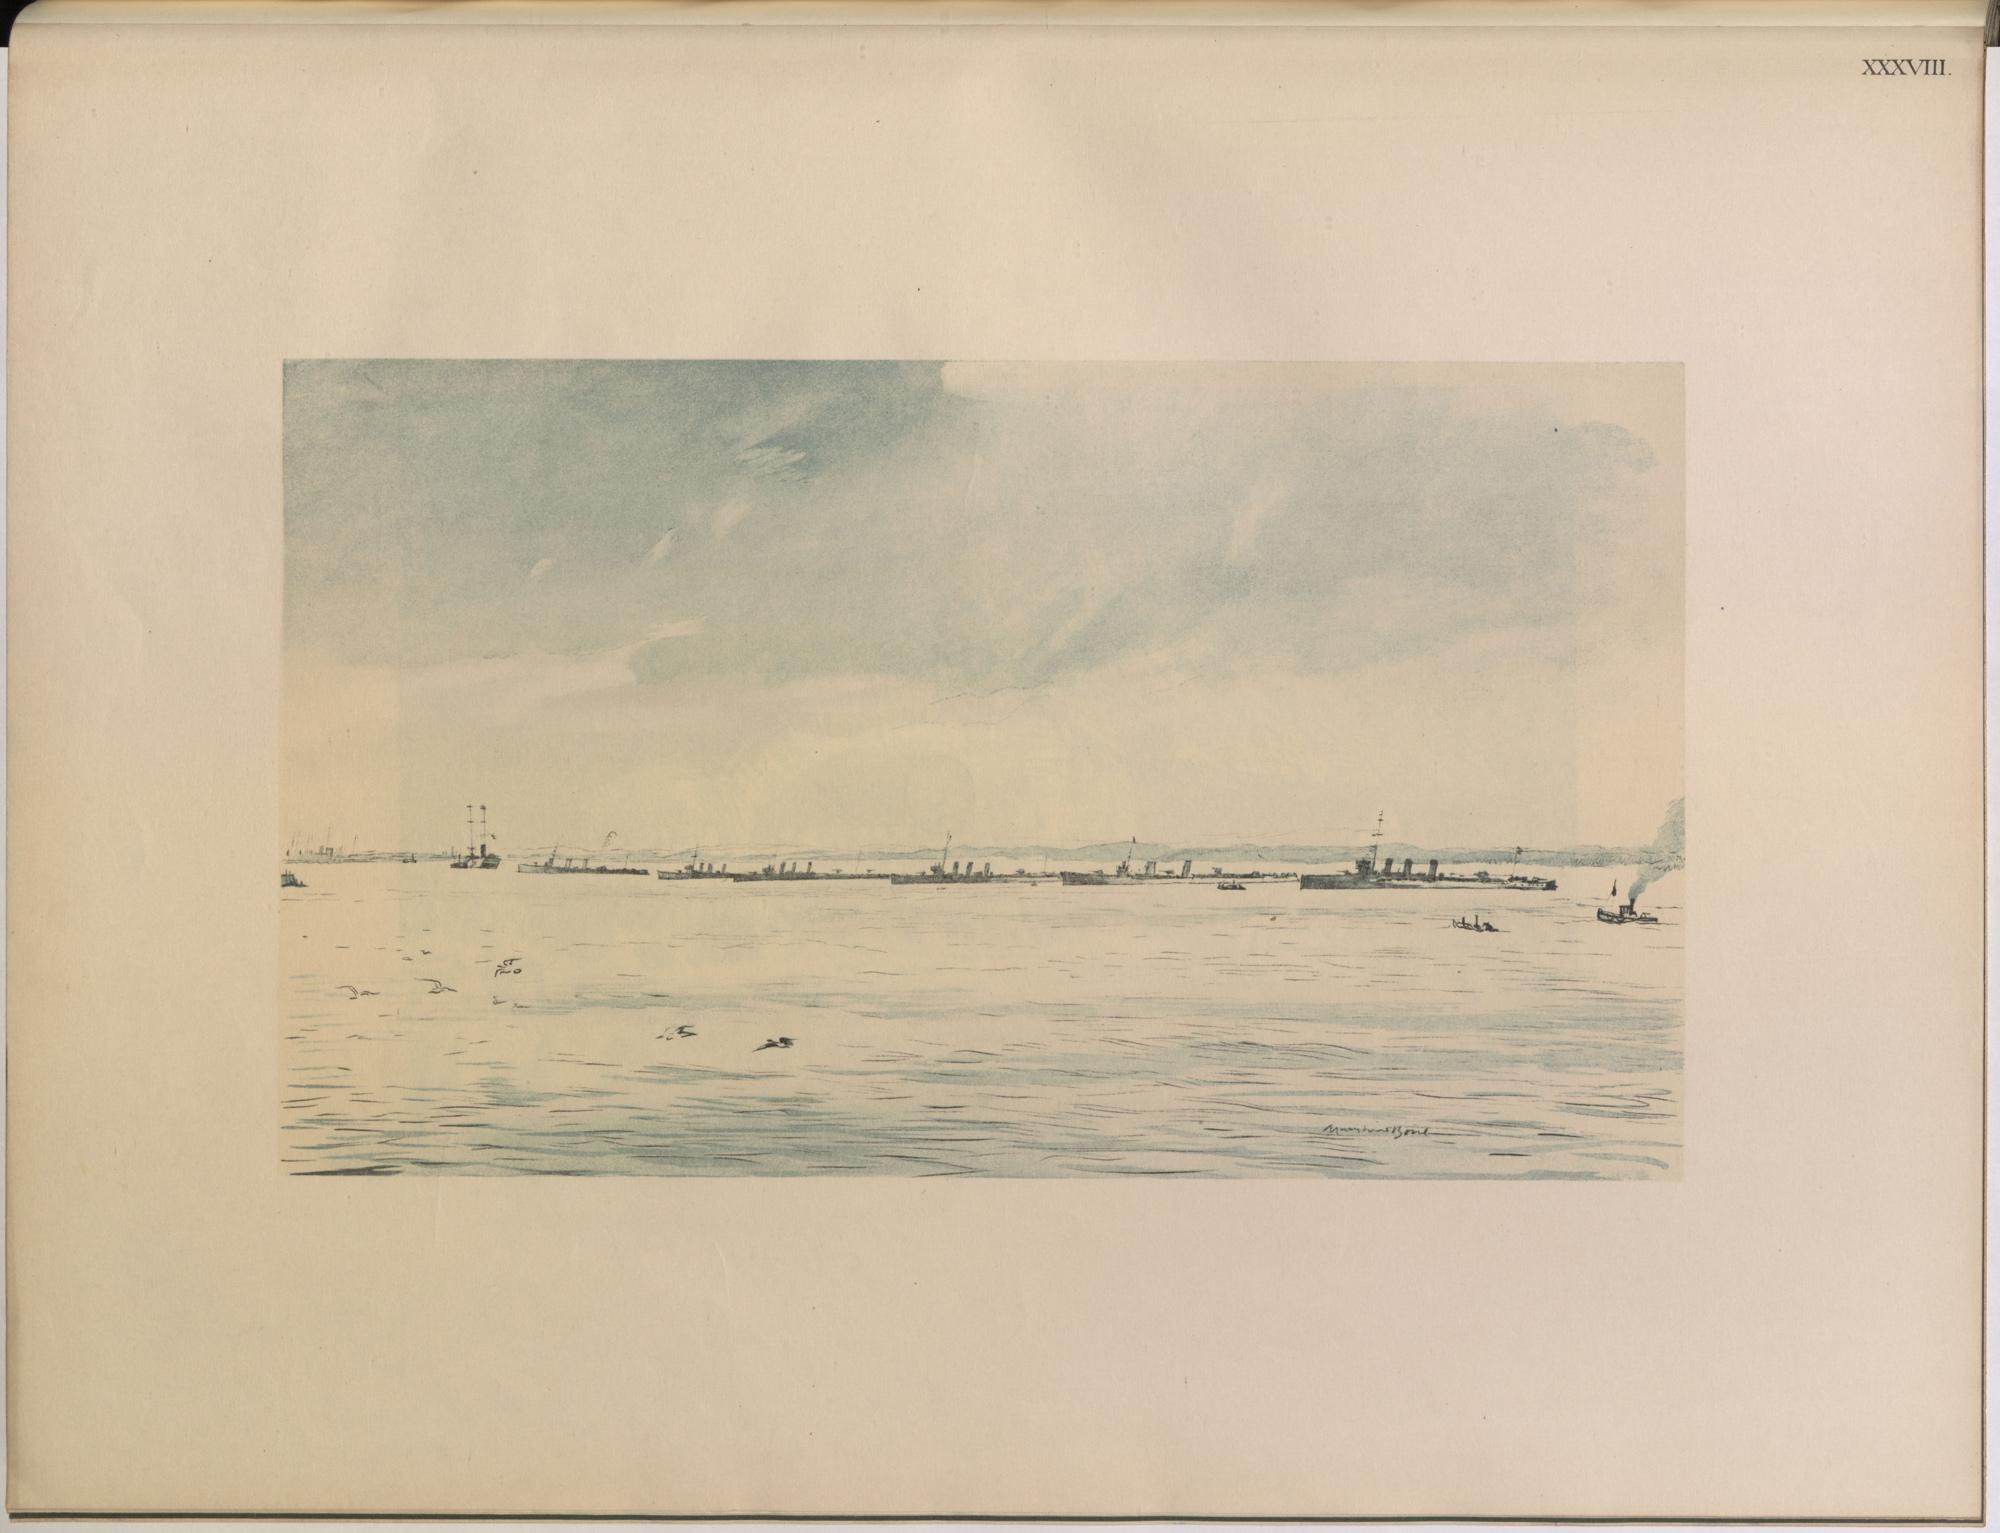 'Line of destroyers' by Muirhead Bone, official British War Artist.